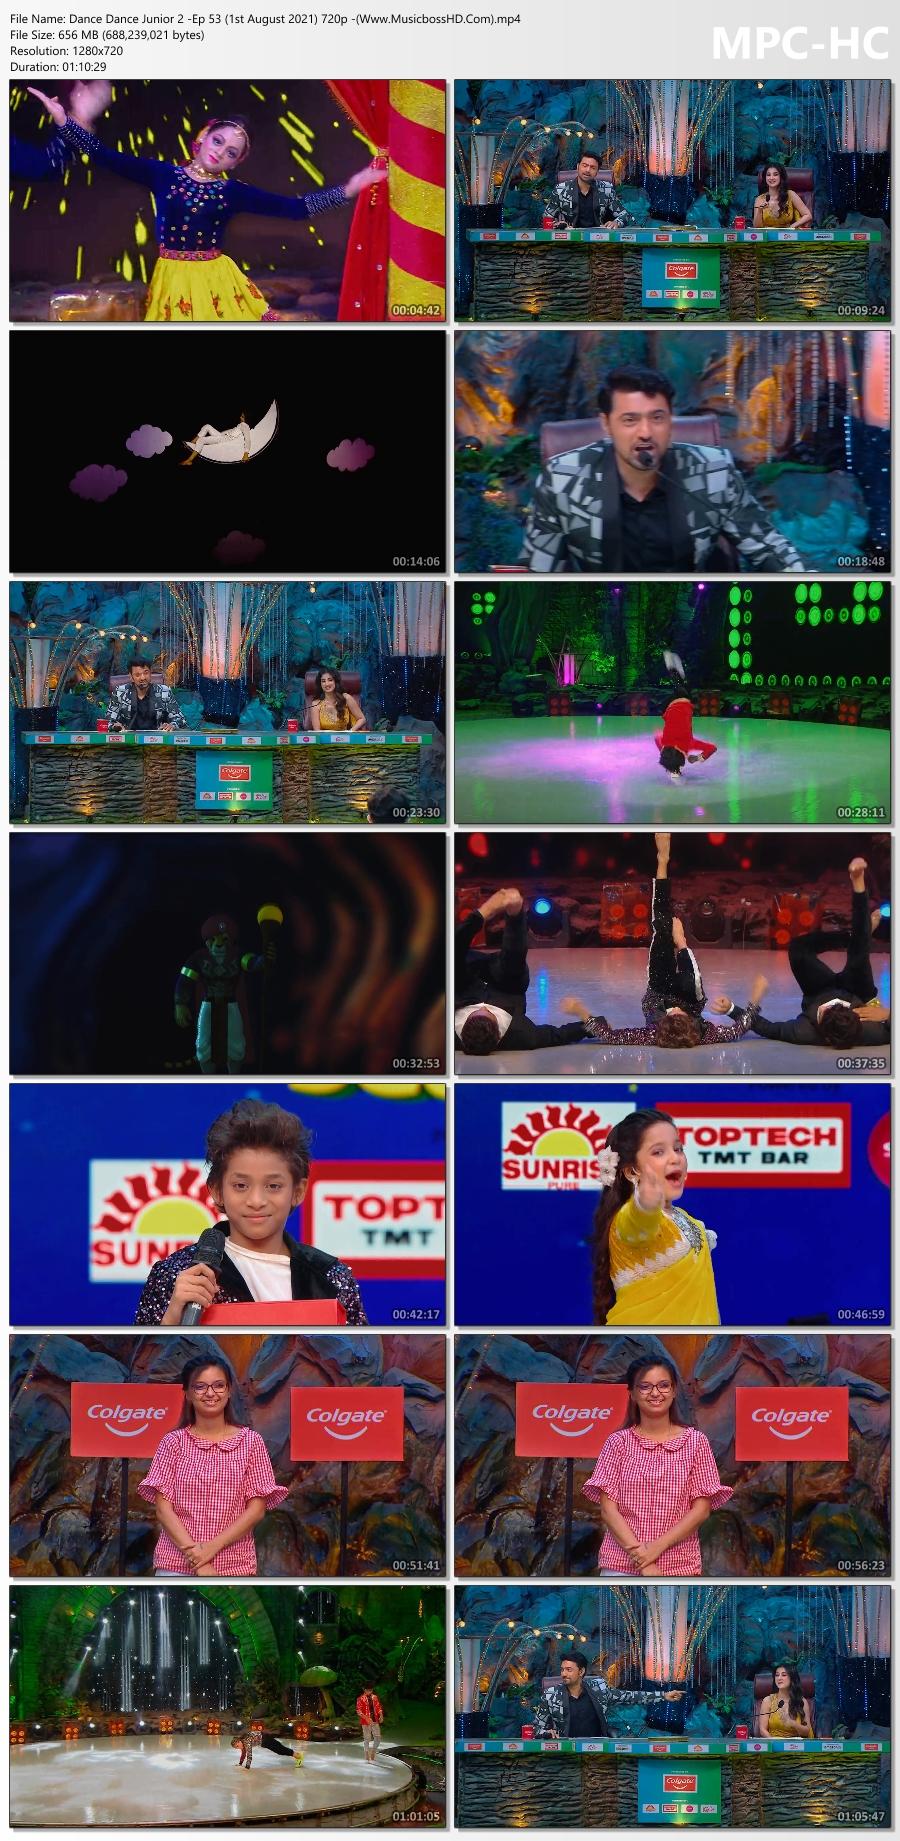 Dance-Dance-Junior-2-Ep-53-1st-August-2021-720p-Www-Musicboss-HD-Com-mp4-thumbs